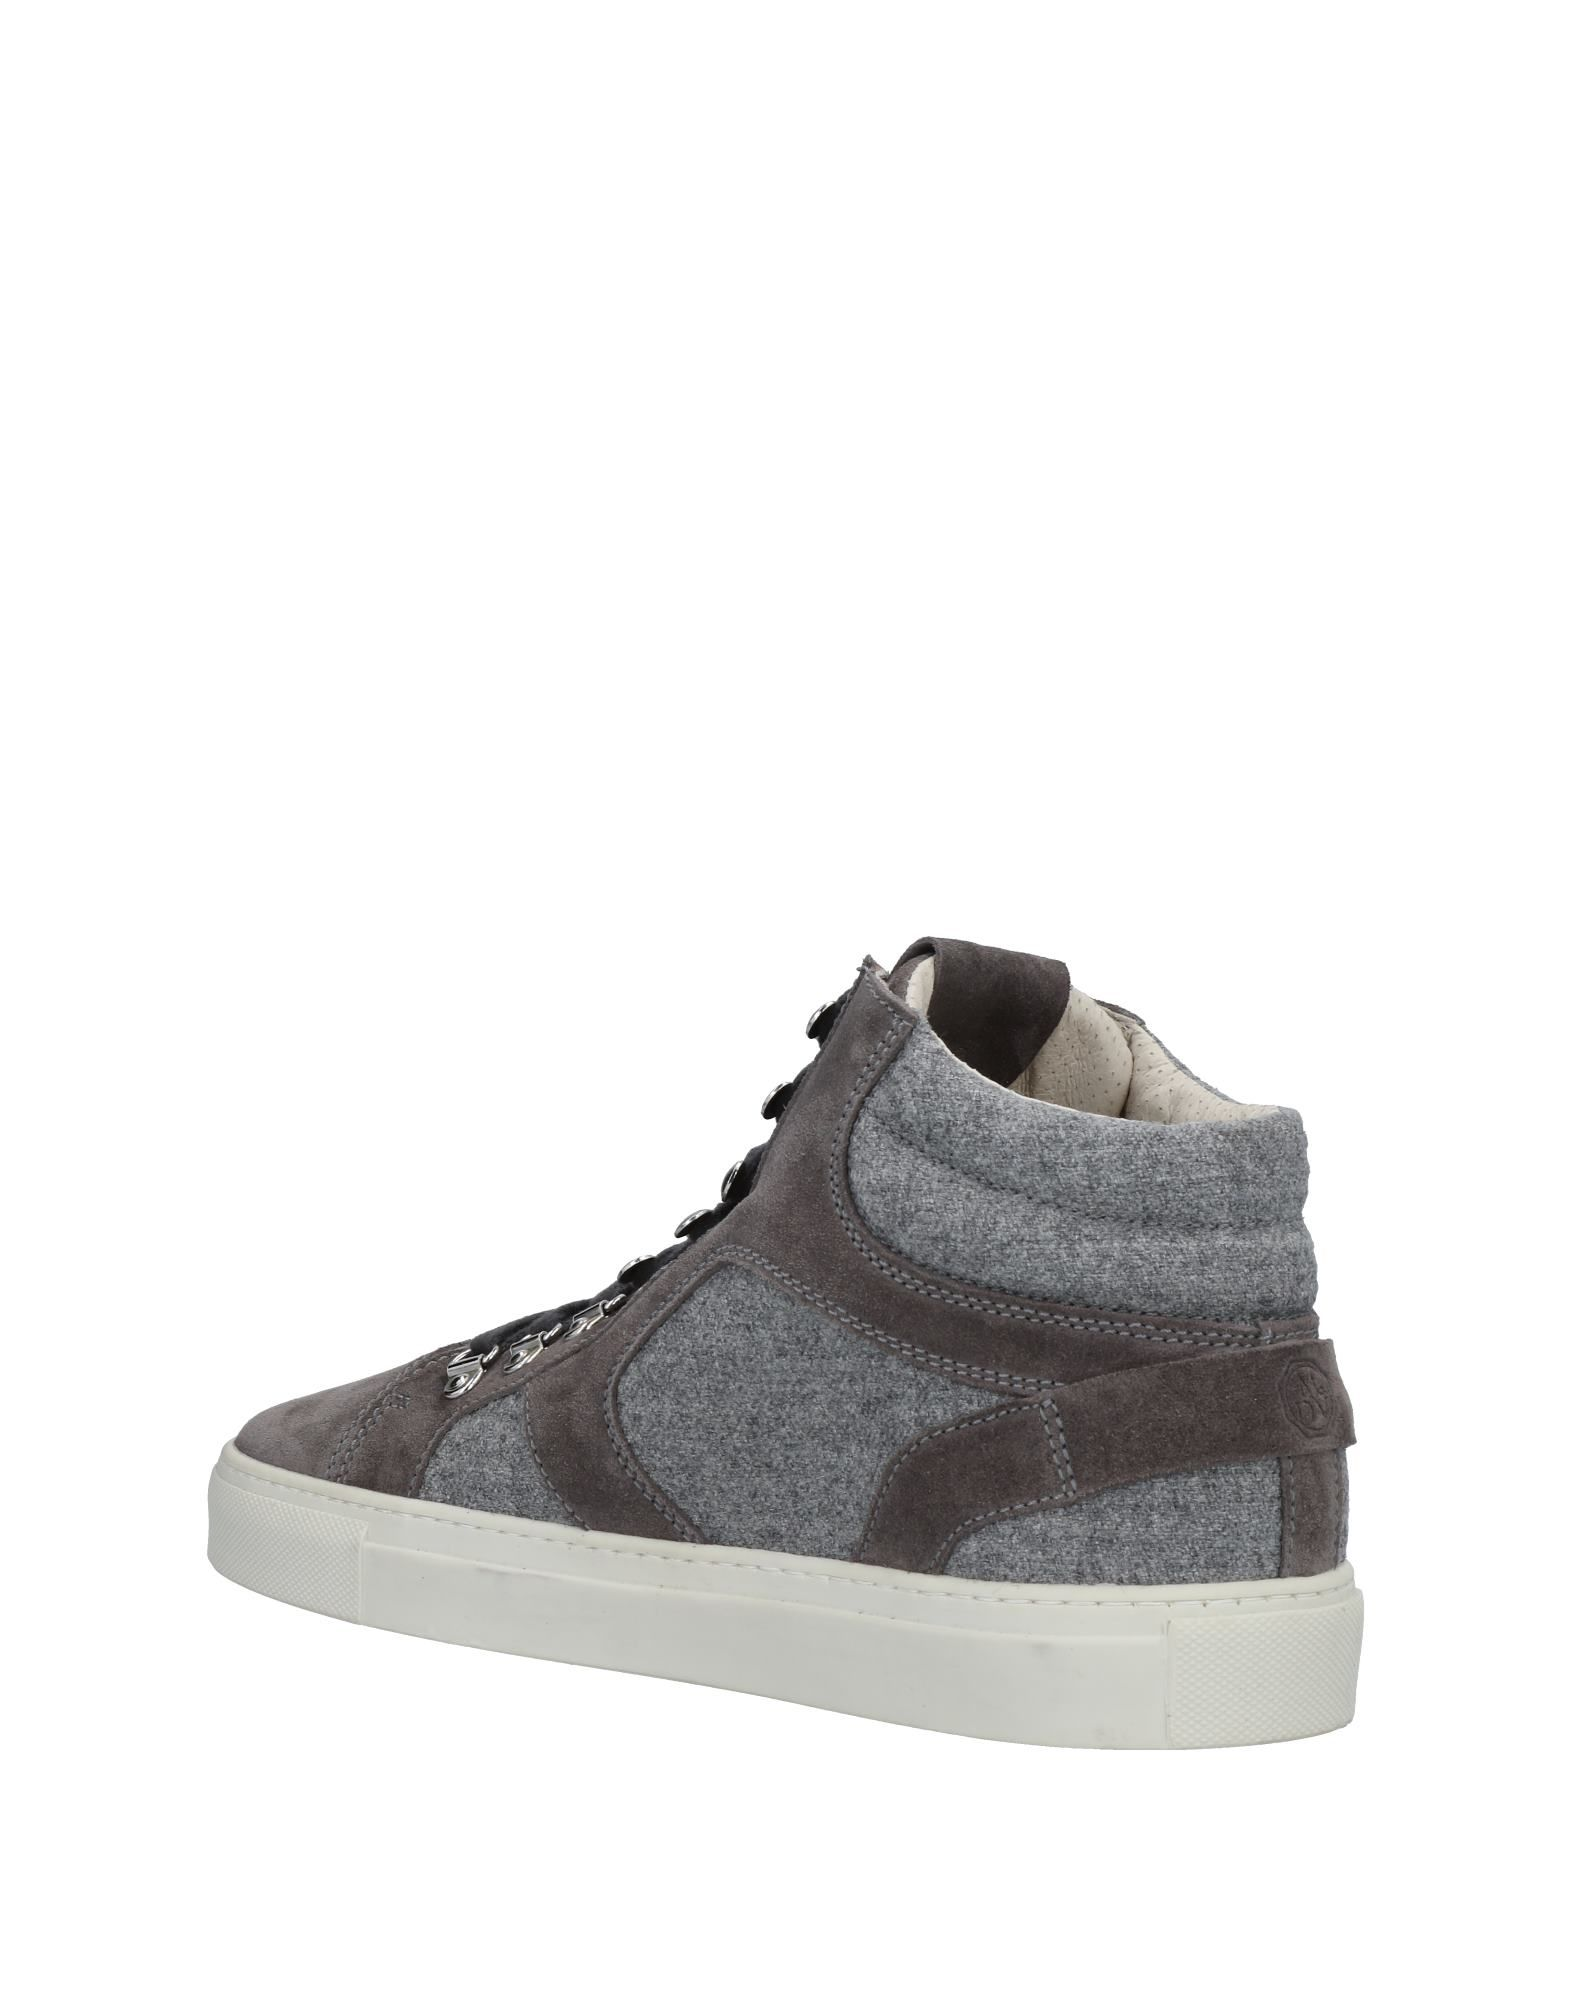 Rabatt echte Schuhe Herren Mariano Di Vaio Sneakers Herren Schuhe  11477482UH 915dd2